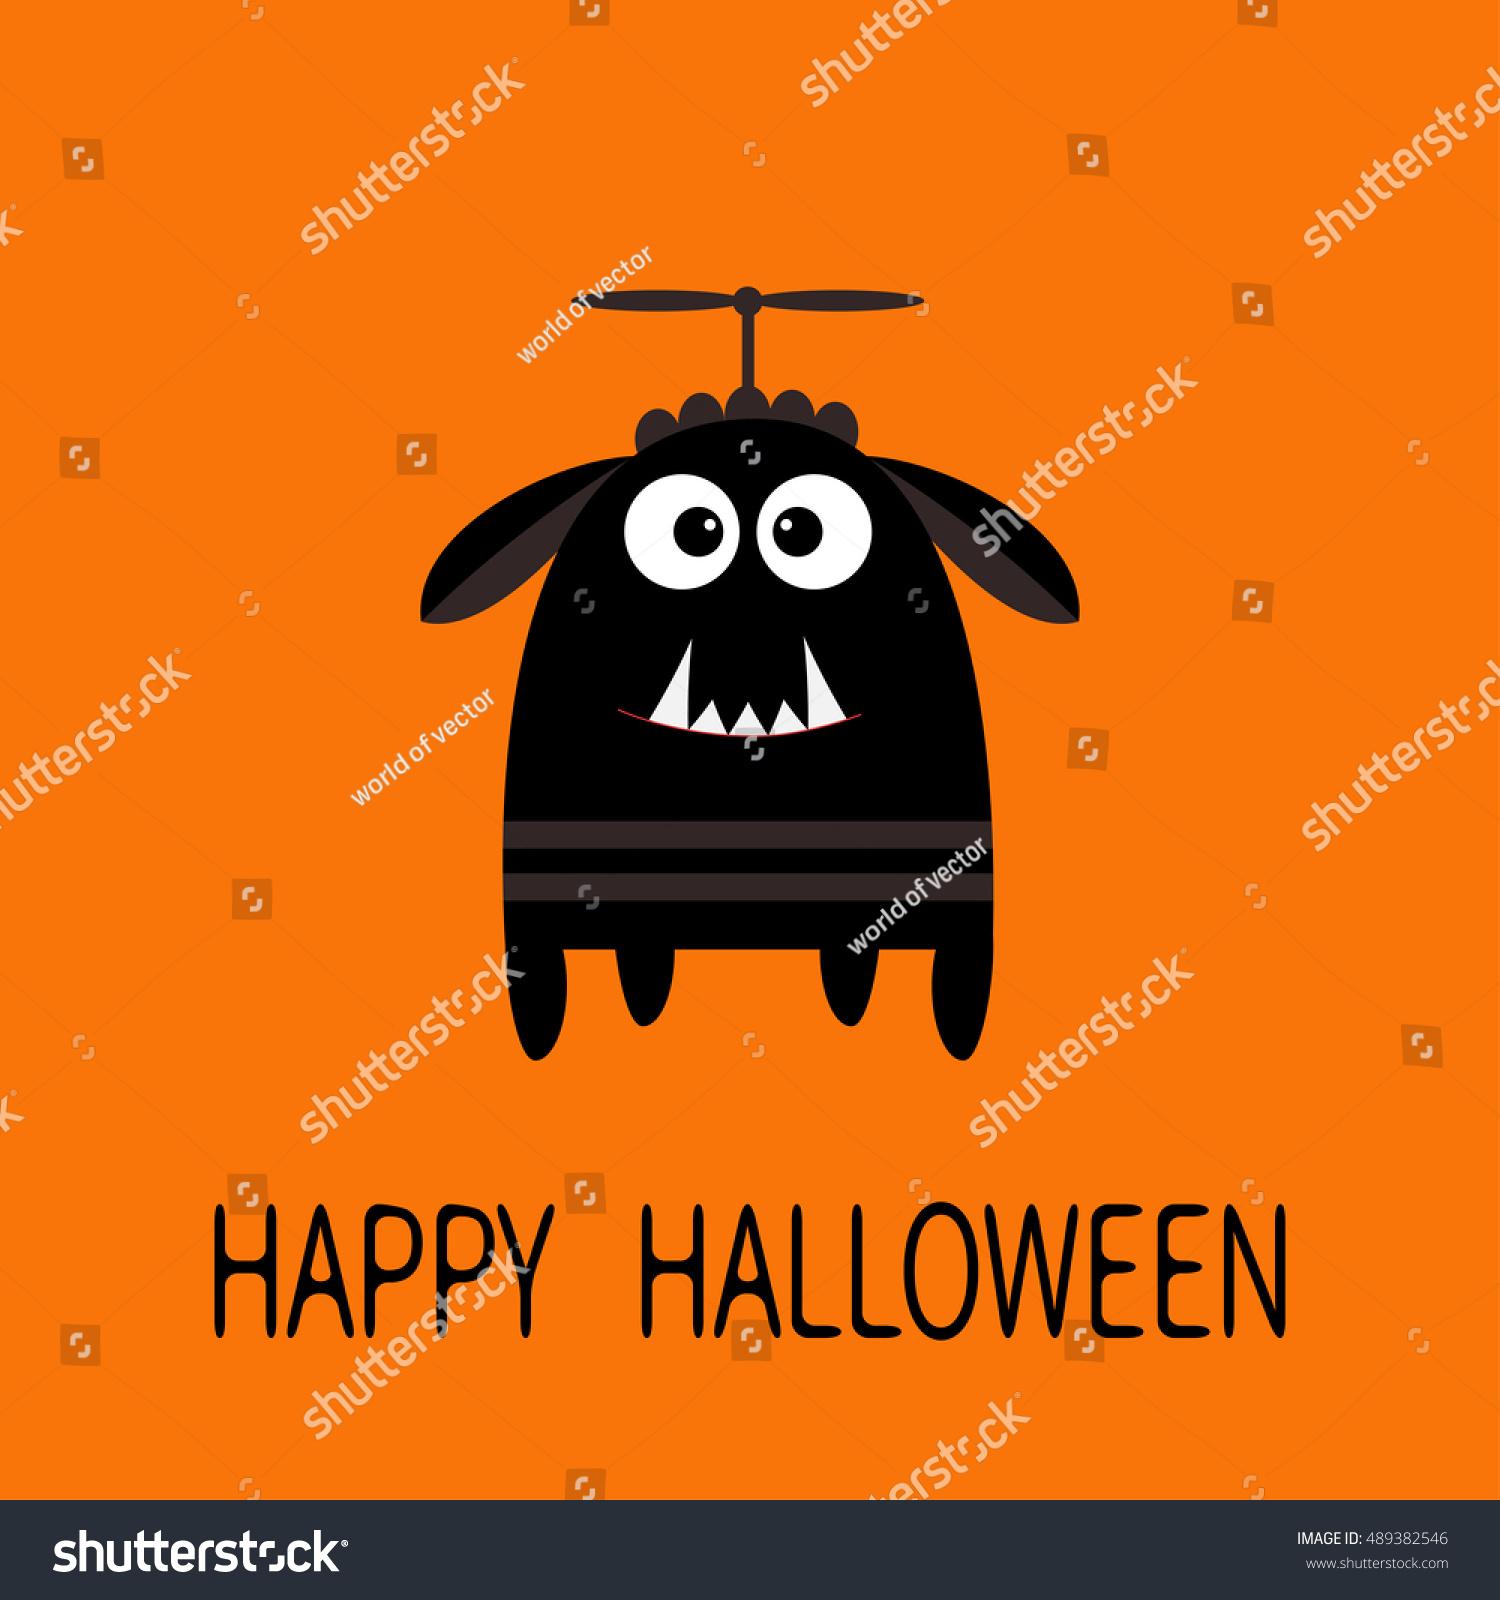 Happy Halloween Greeting Card Black Silhouette Stock Vector